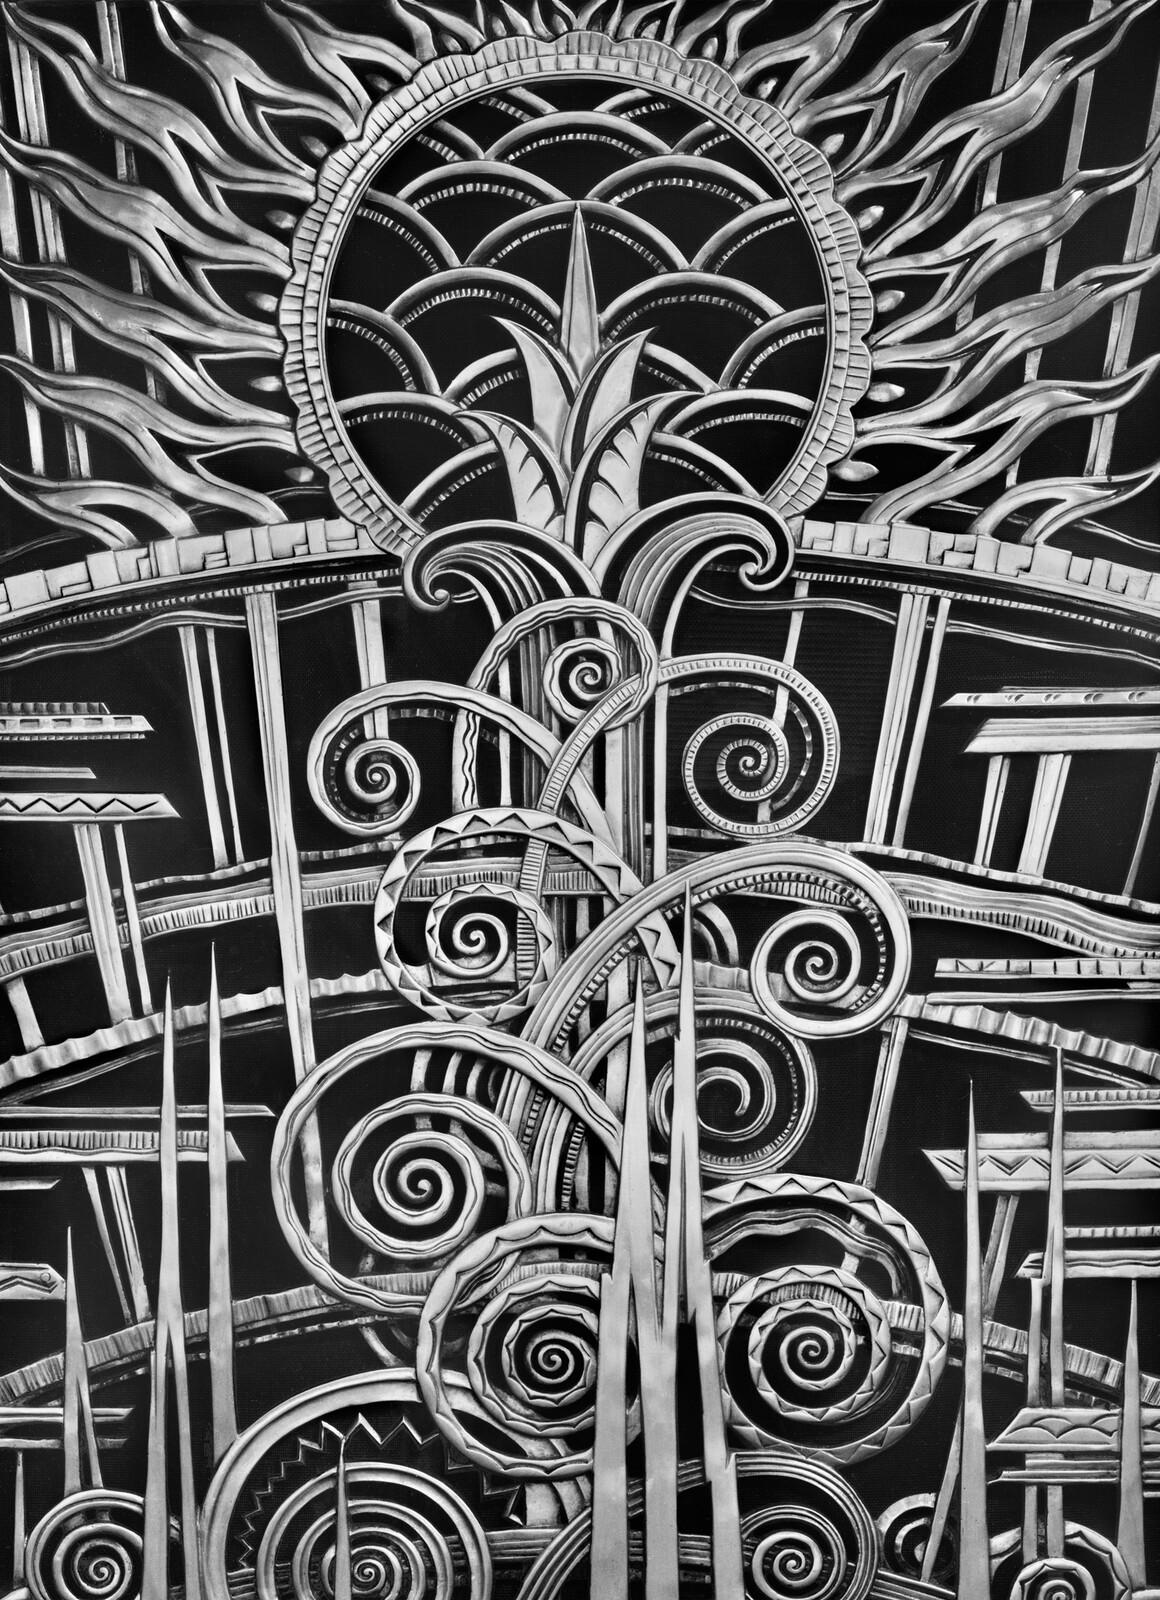 Enlightment - Andrew Bordwin